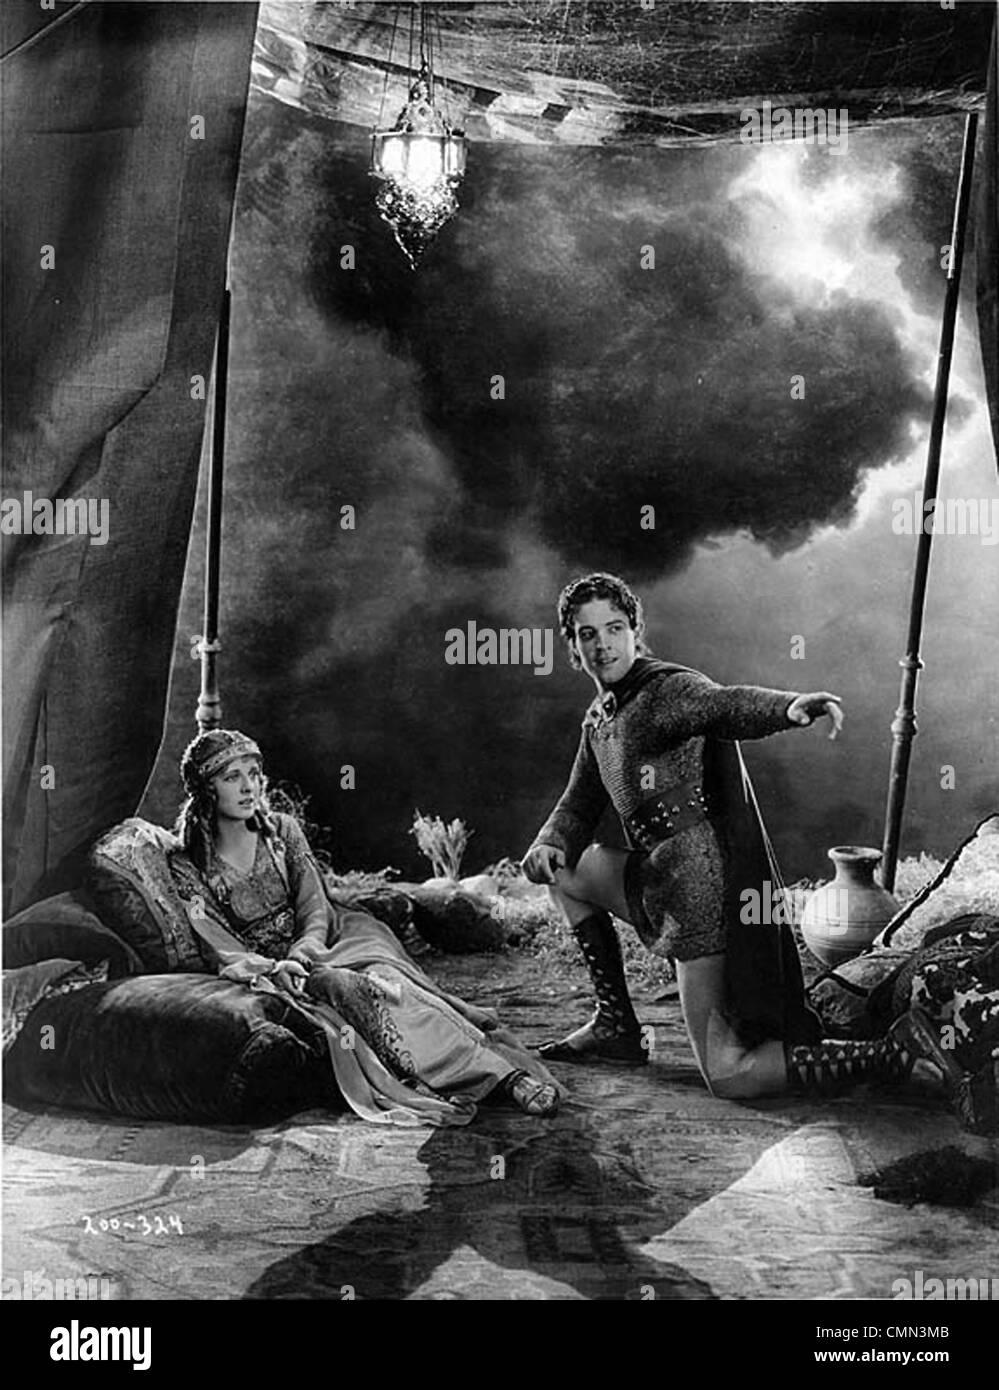 BEN HUR A TALE OF THE CHRIST (1925) RAMON NOVARRO, FRED NIBLO (DIR) 002 MOVIESTORE COLLECTION LTD - Stock Image